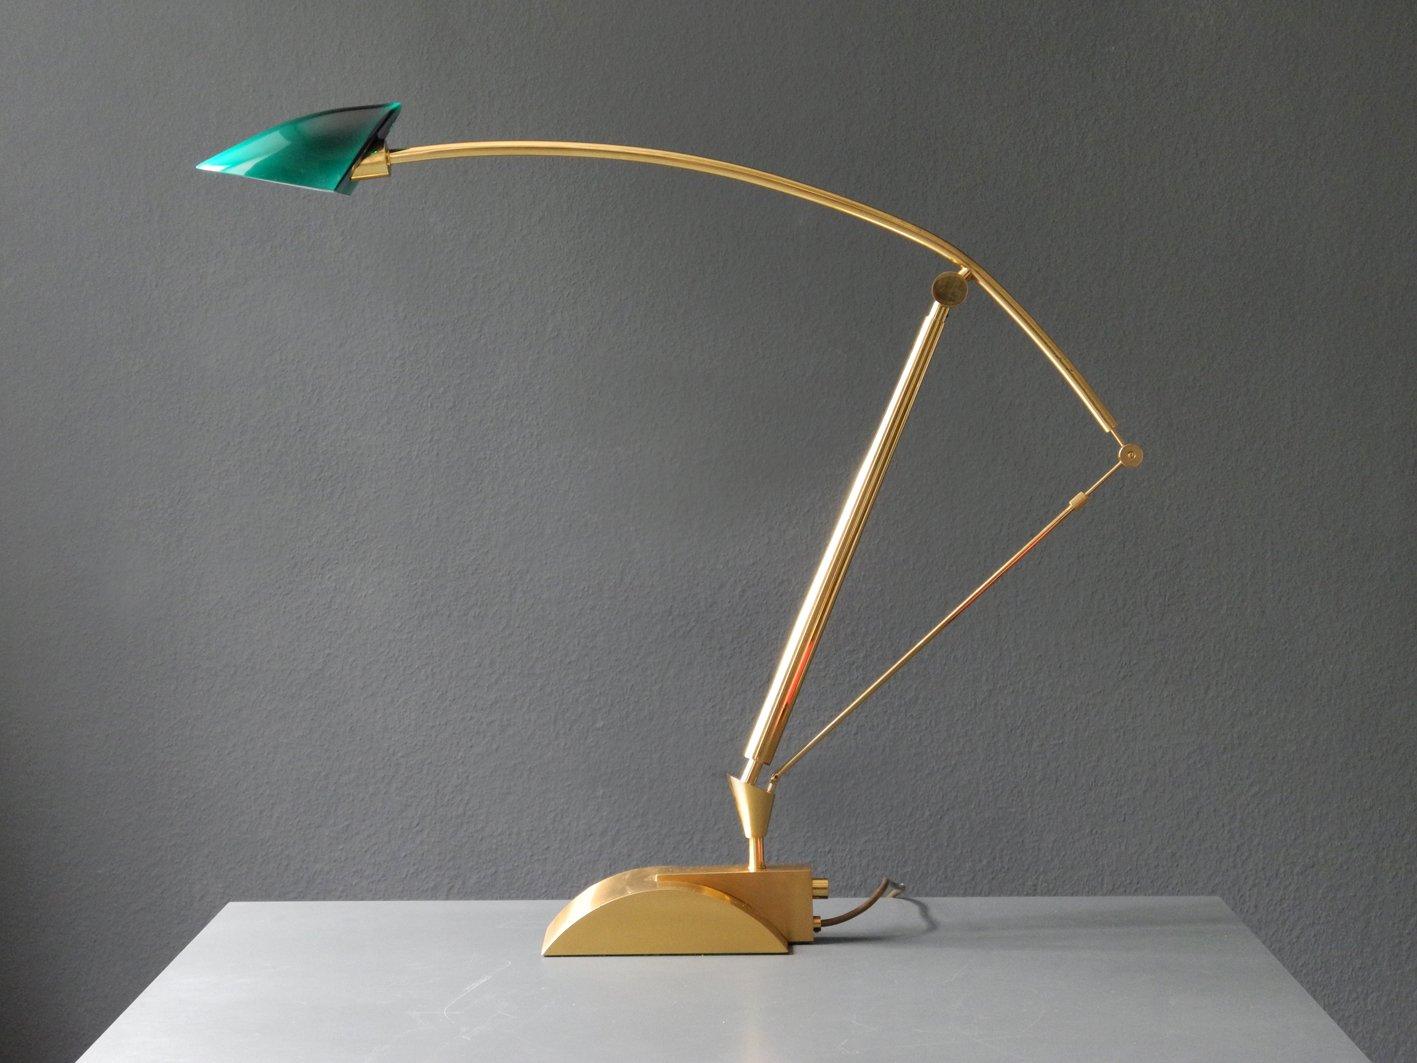 Grande lampe de bureau ajustable halog ne en laiton avec - Lampe de bureau banquier laiton verre vert ...